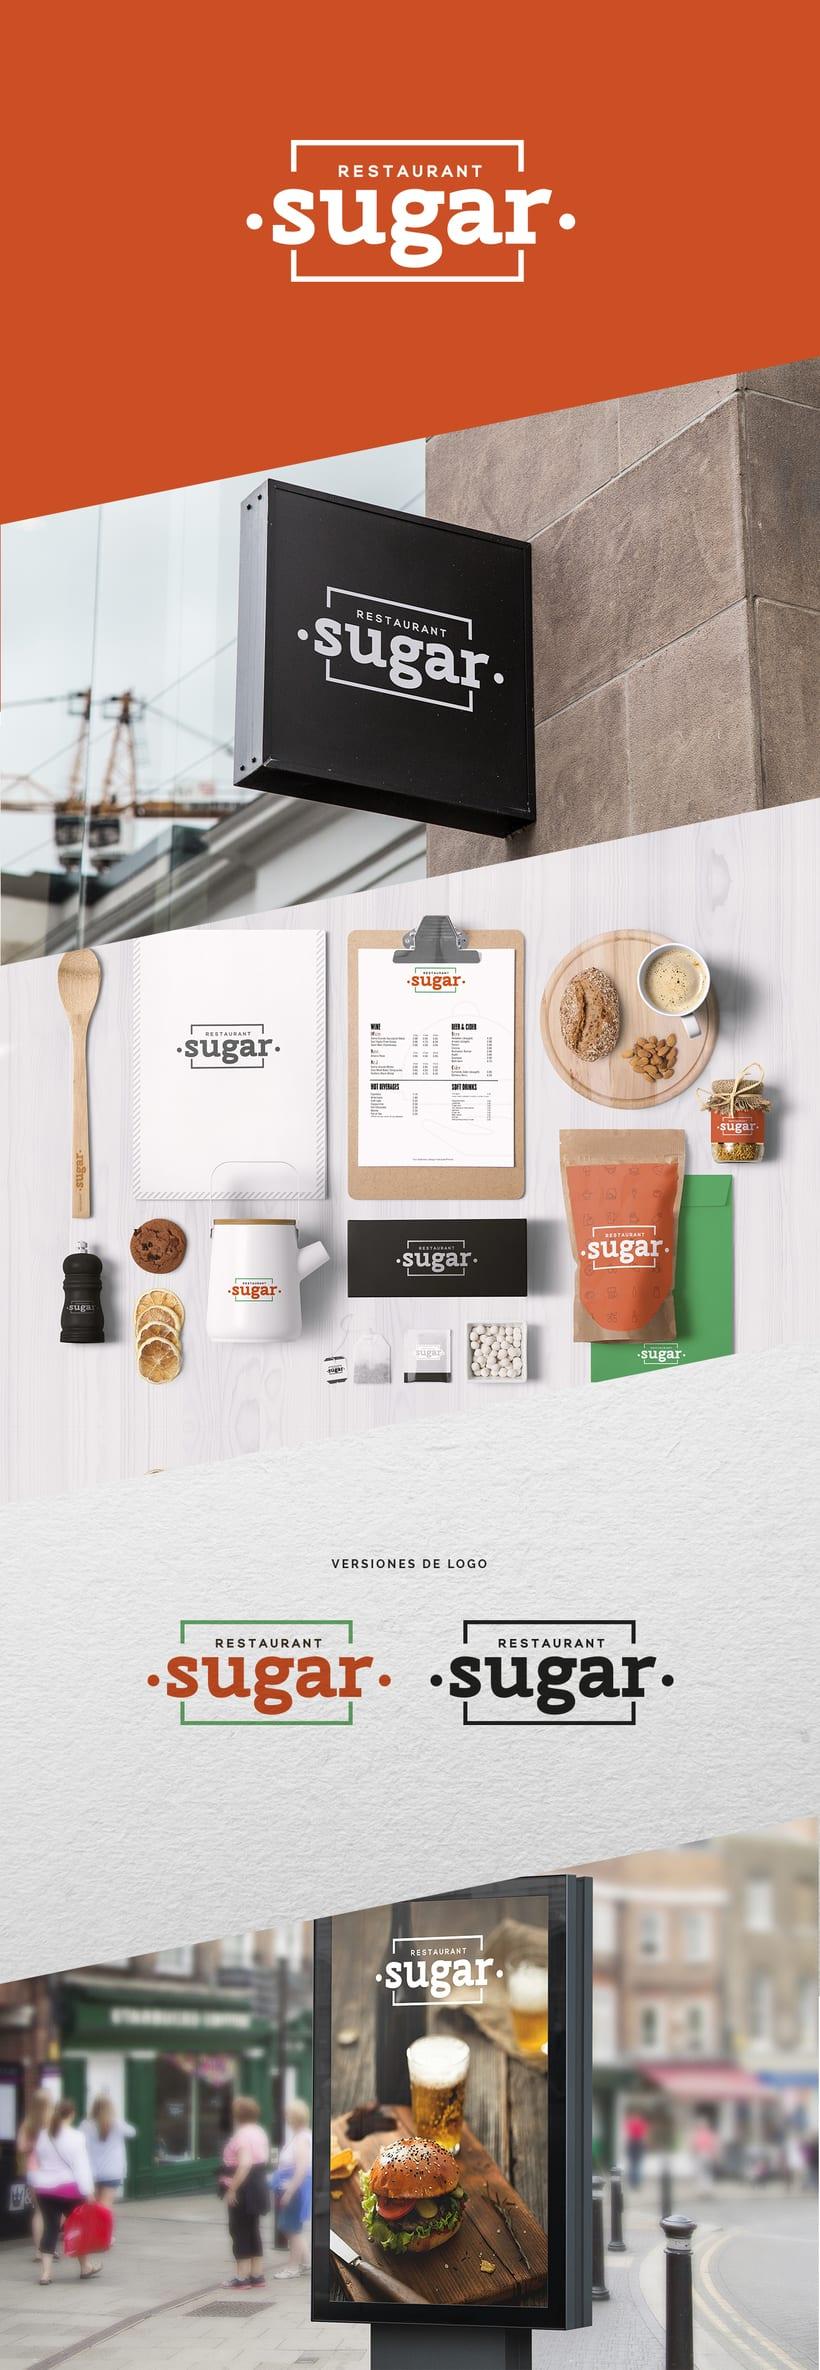 Restaurant Sugar - Branding -1